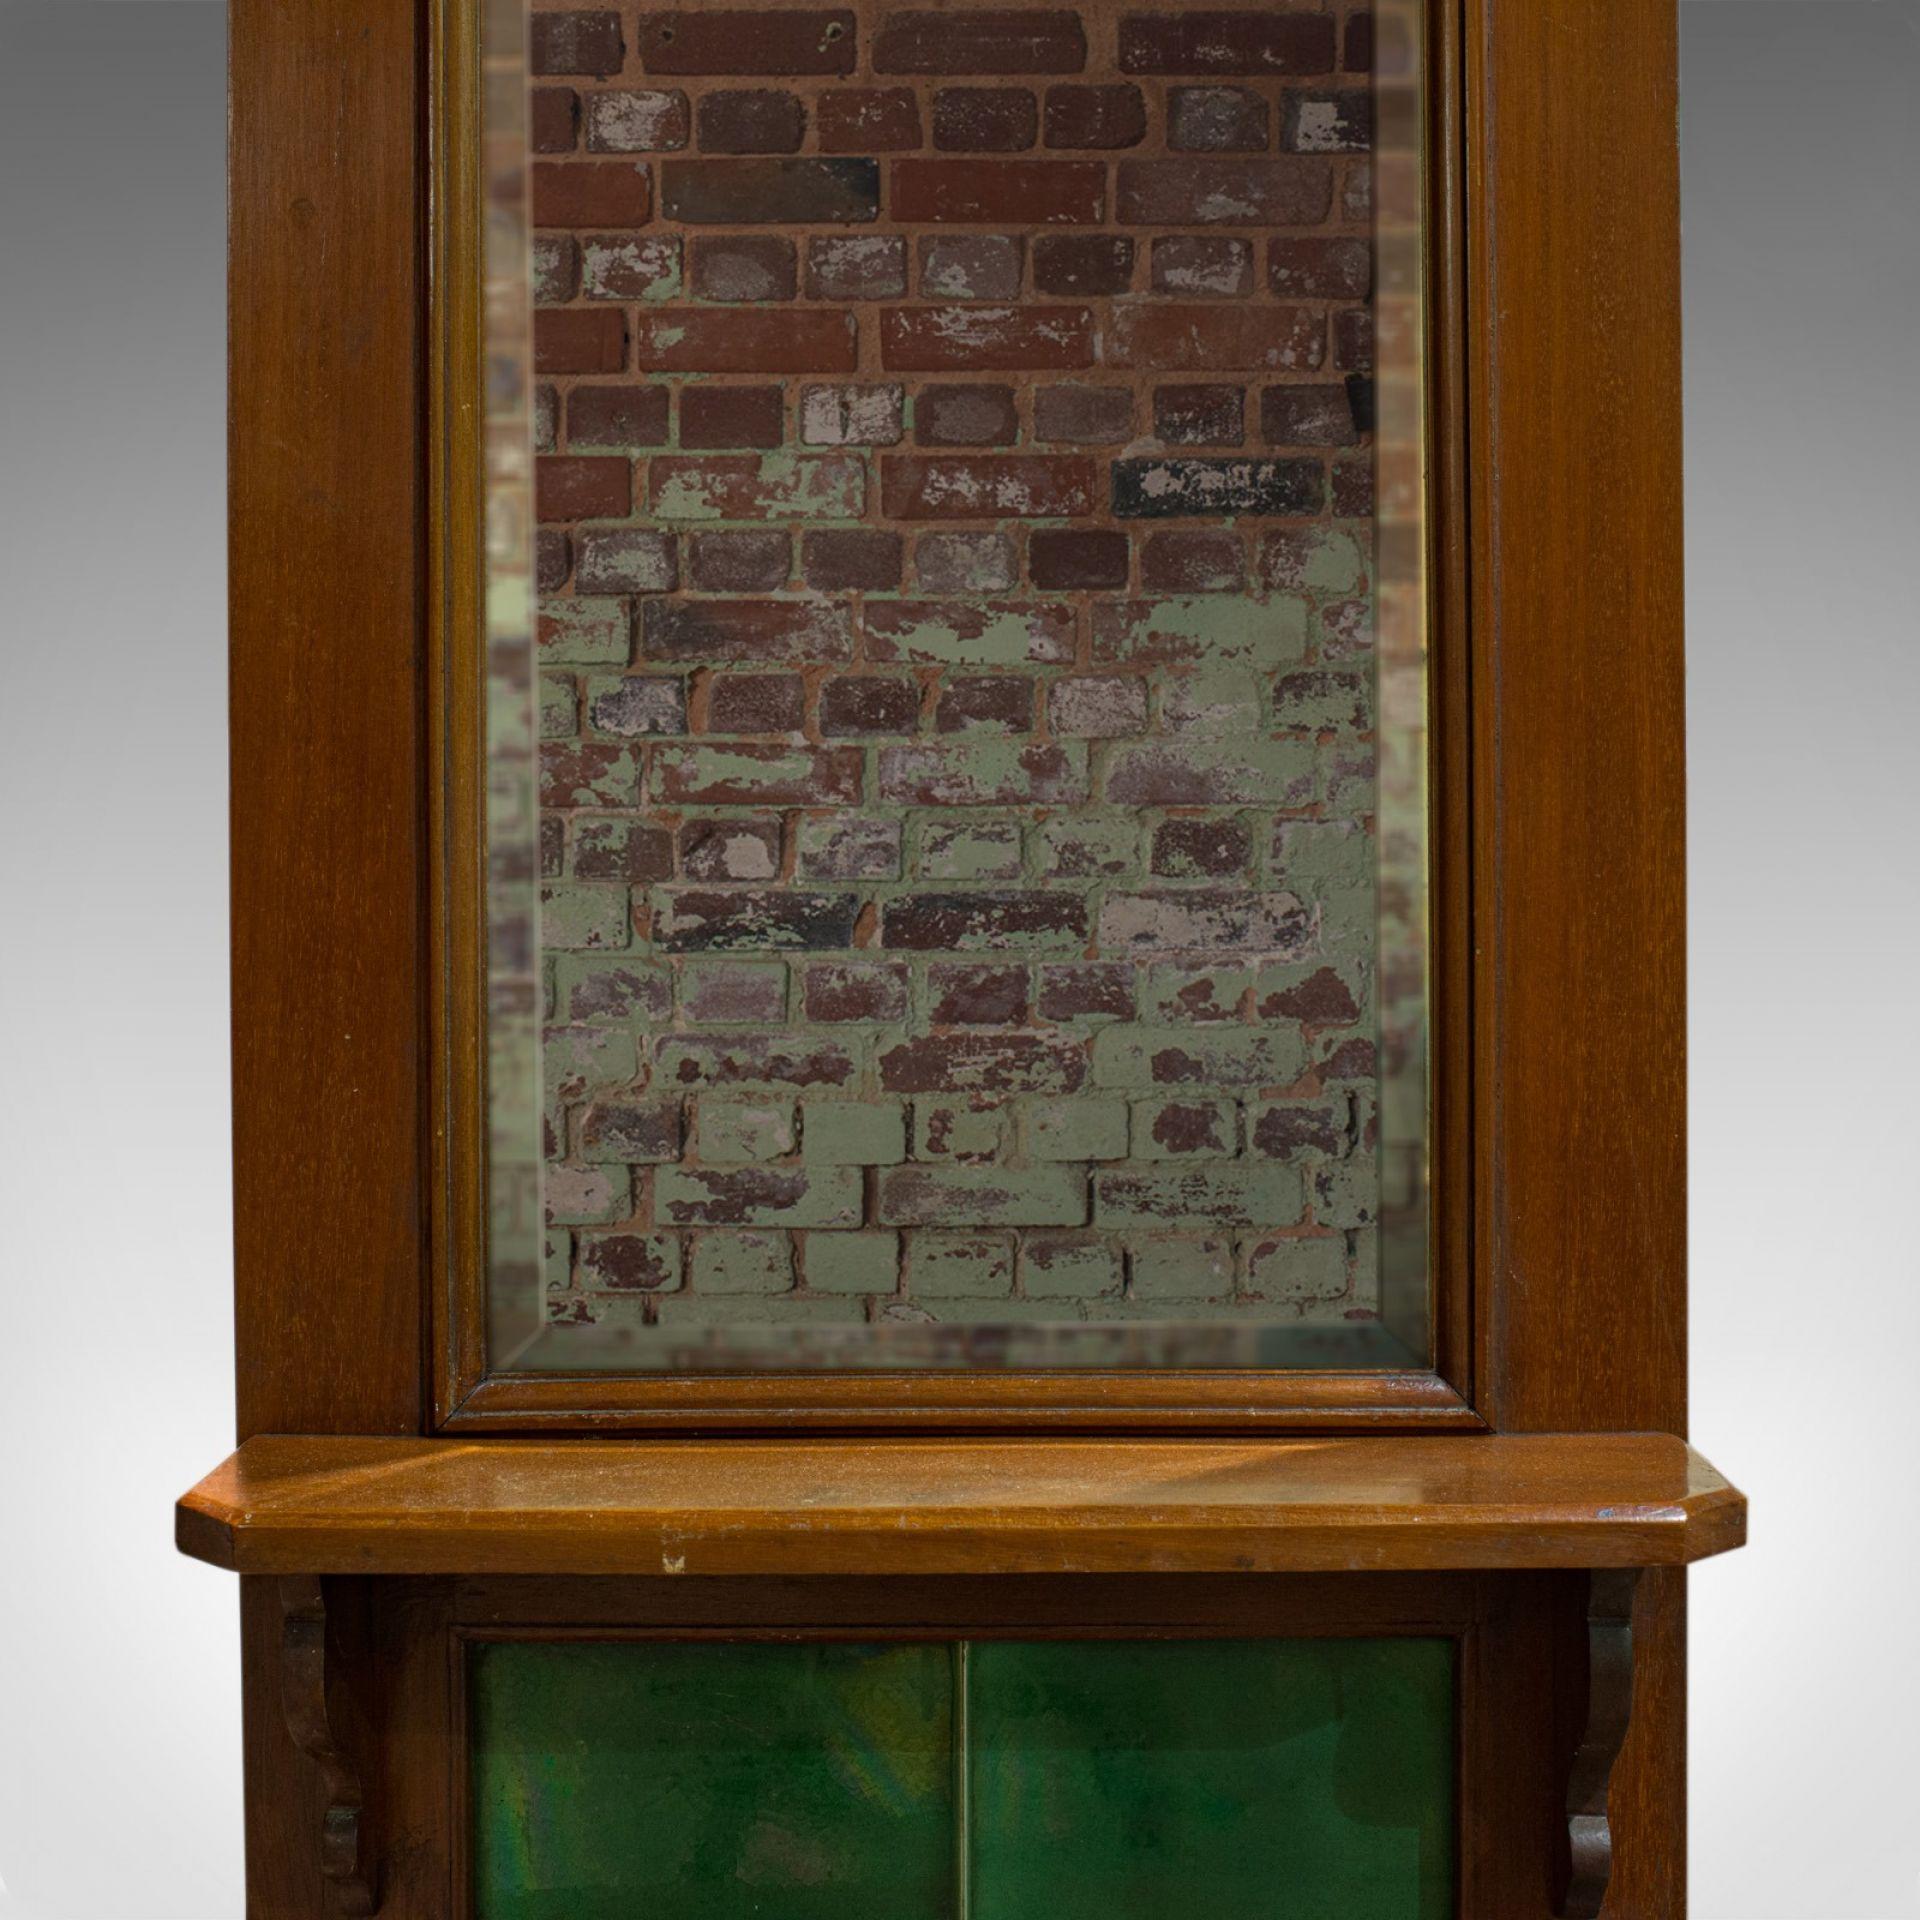 Antique Hall Stand, English, Walnut, Stick, Coat, Hat Stand, Edwardian, C.1910